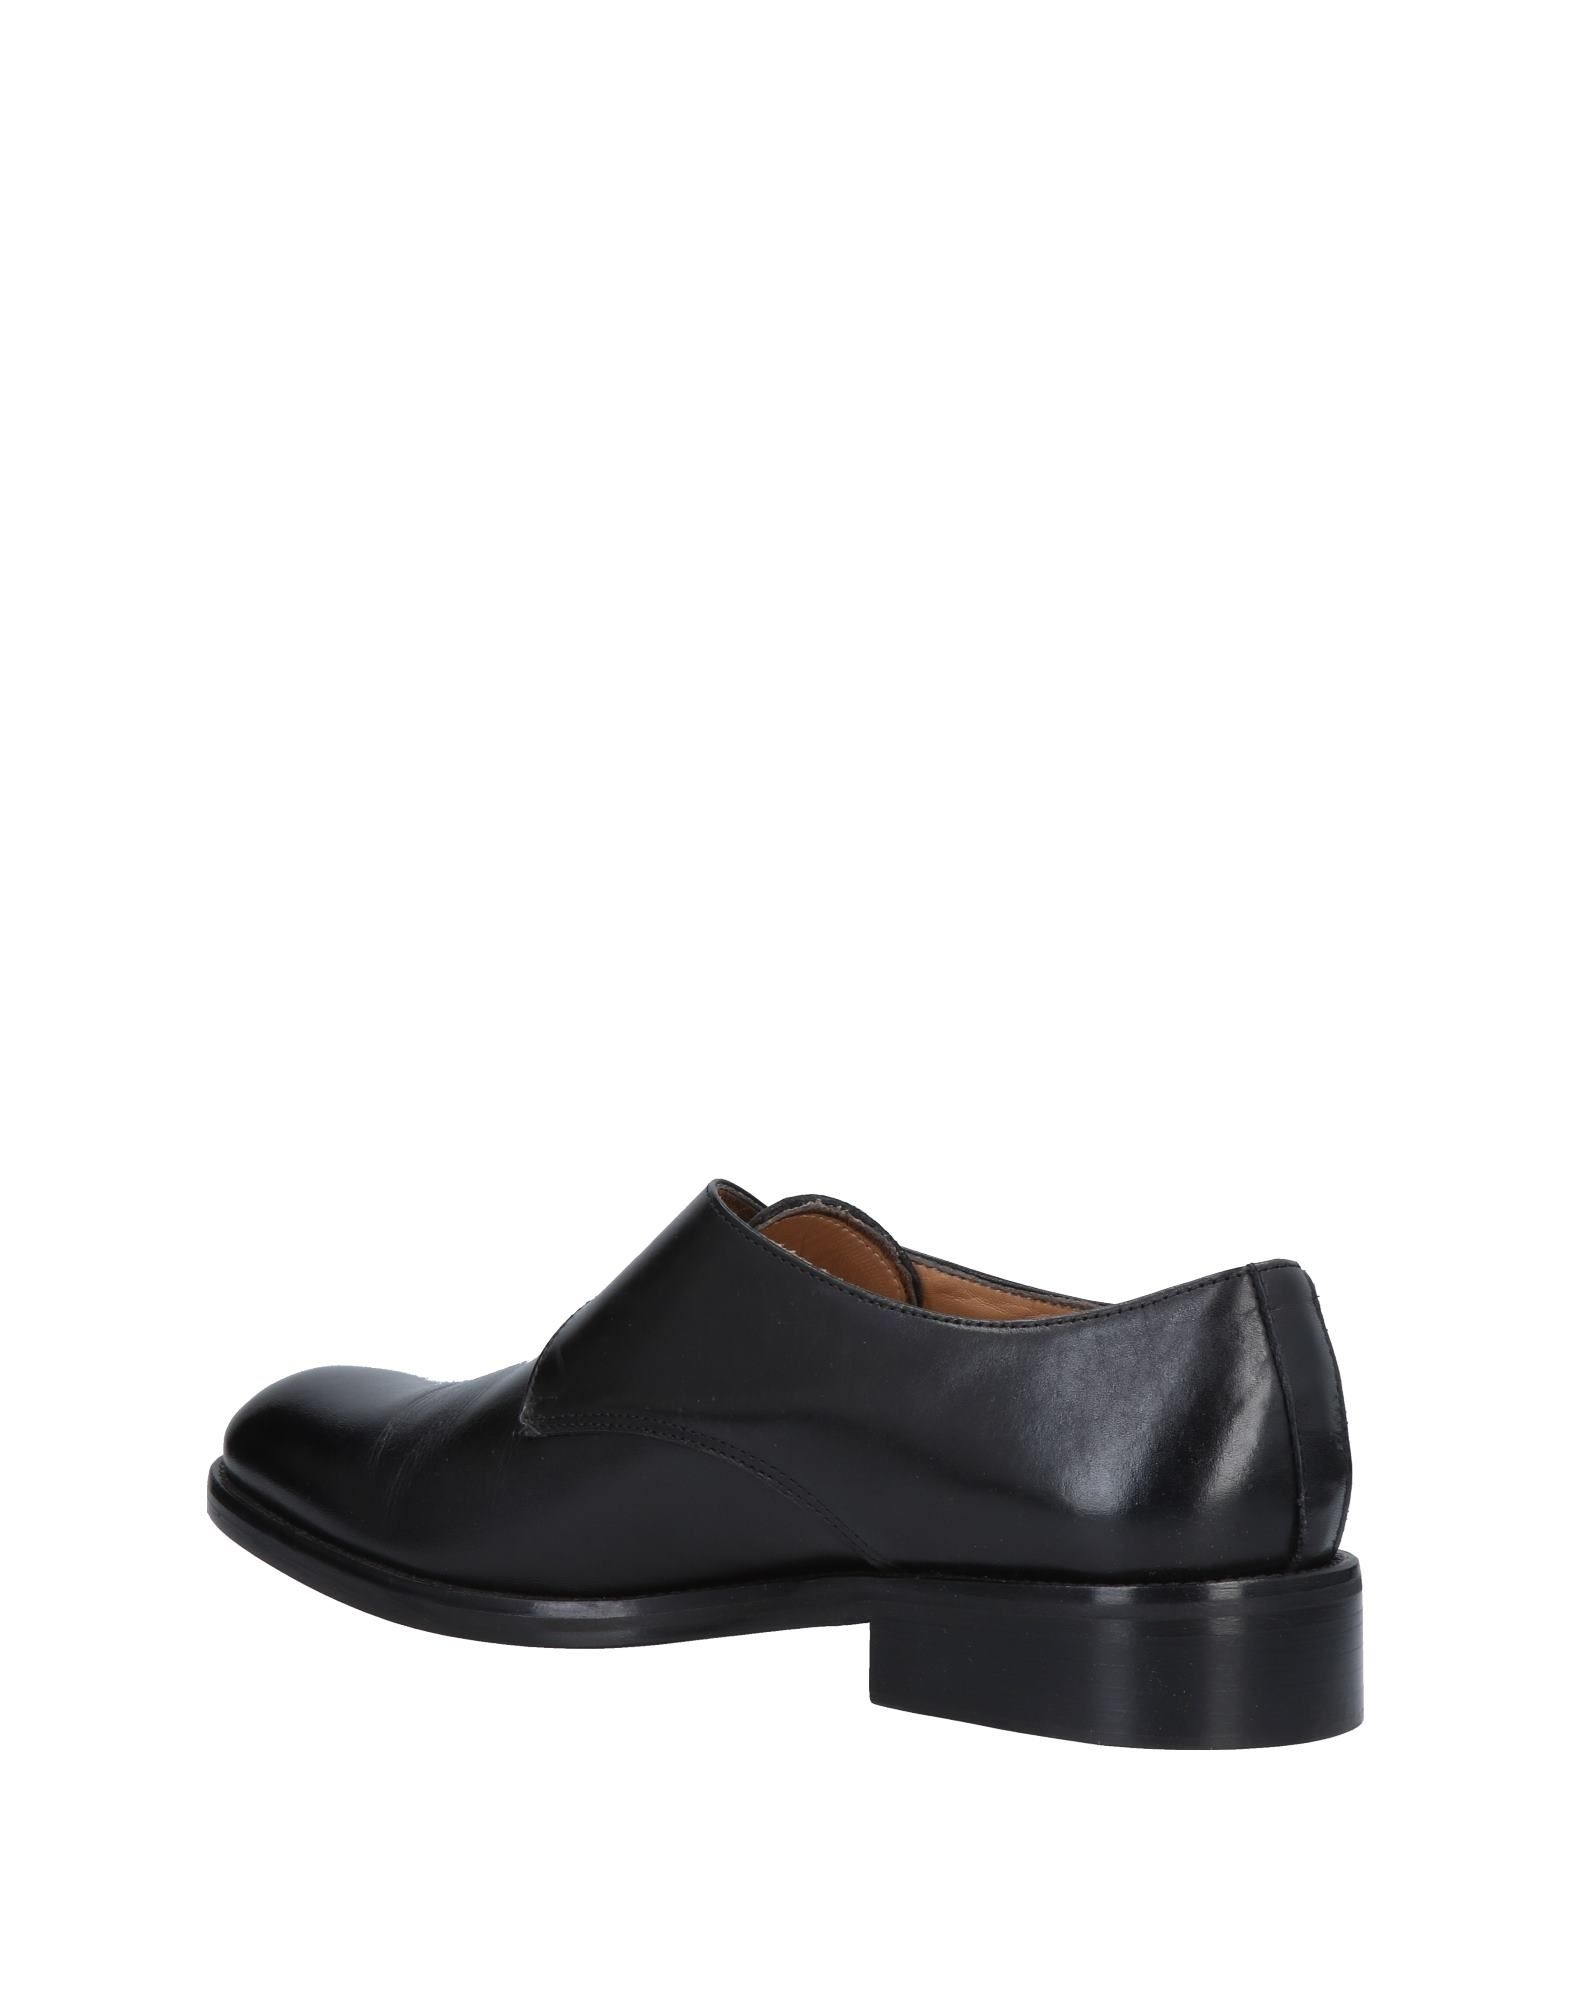 Rabatt Calzolaio echte Schuhe Il Calzolaio Rabatt Mokassins Herren  11475439BB 9ecd73